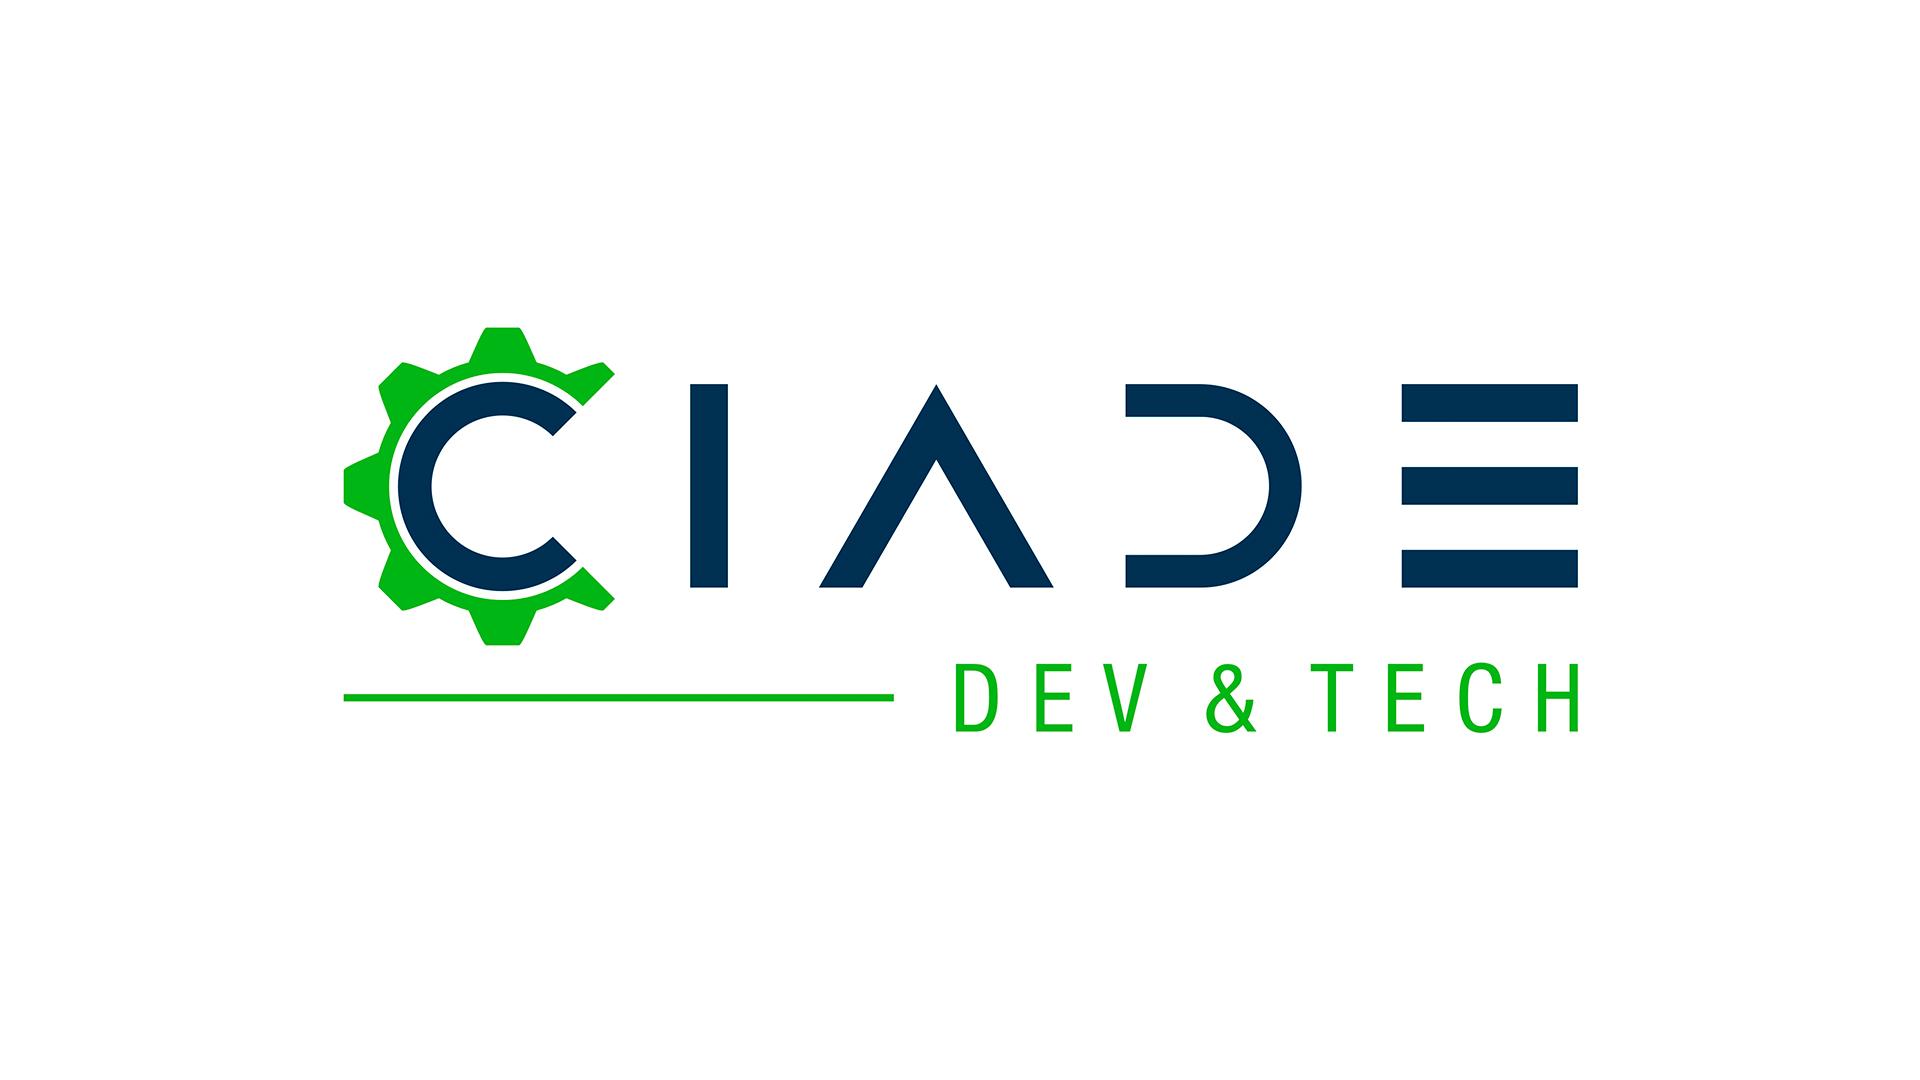 Ciade Dev & Tech